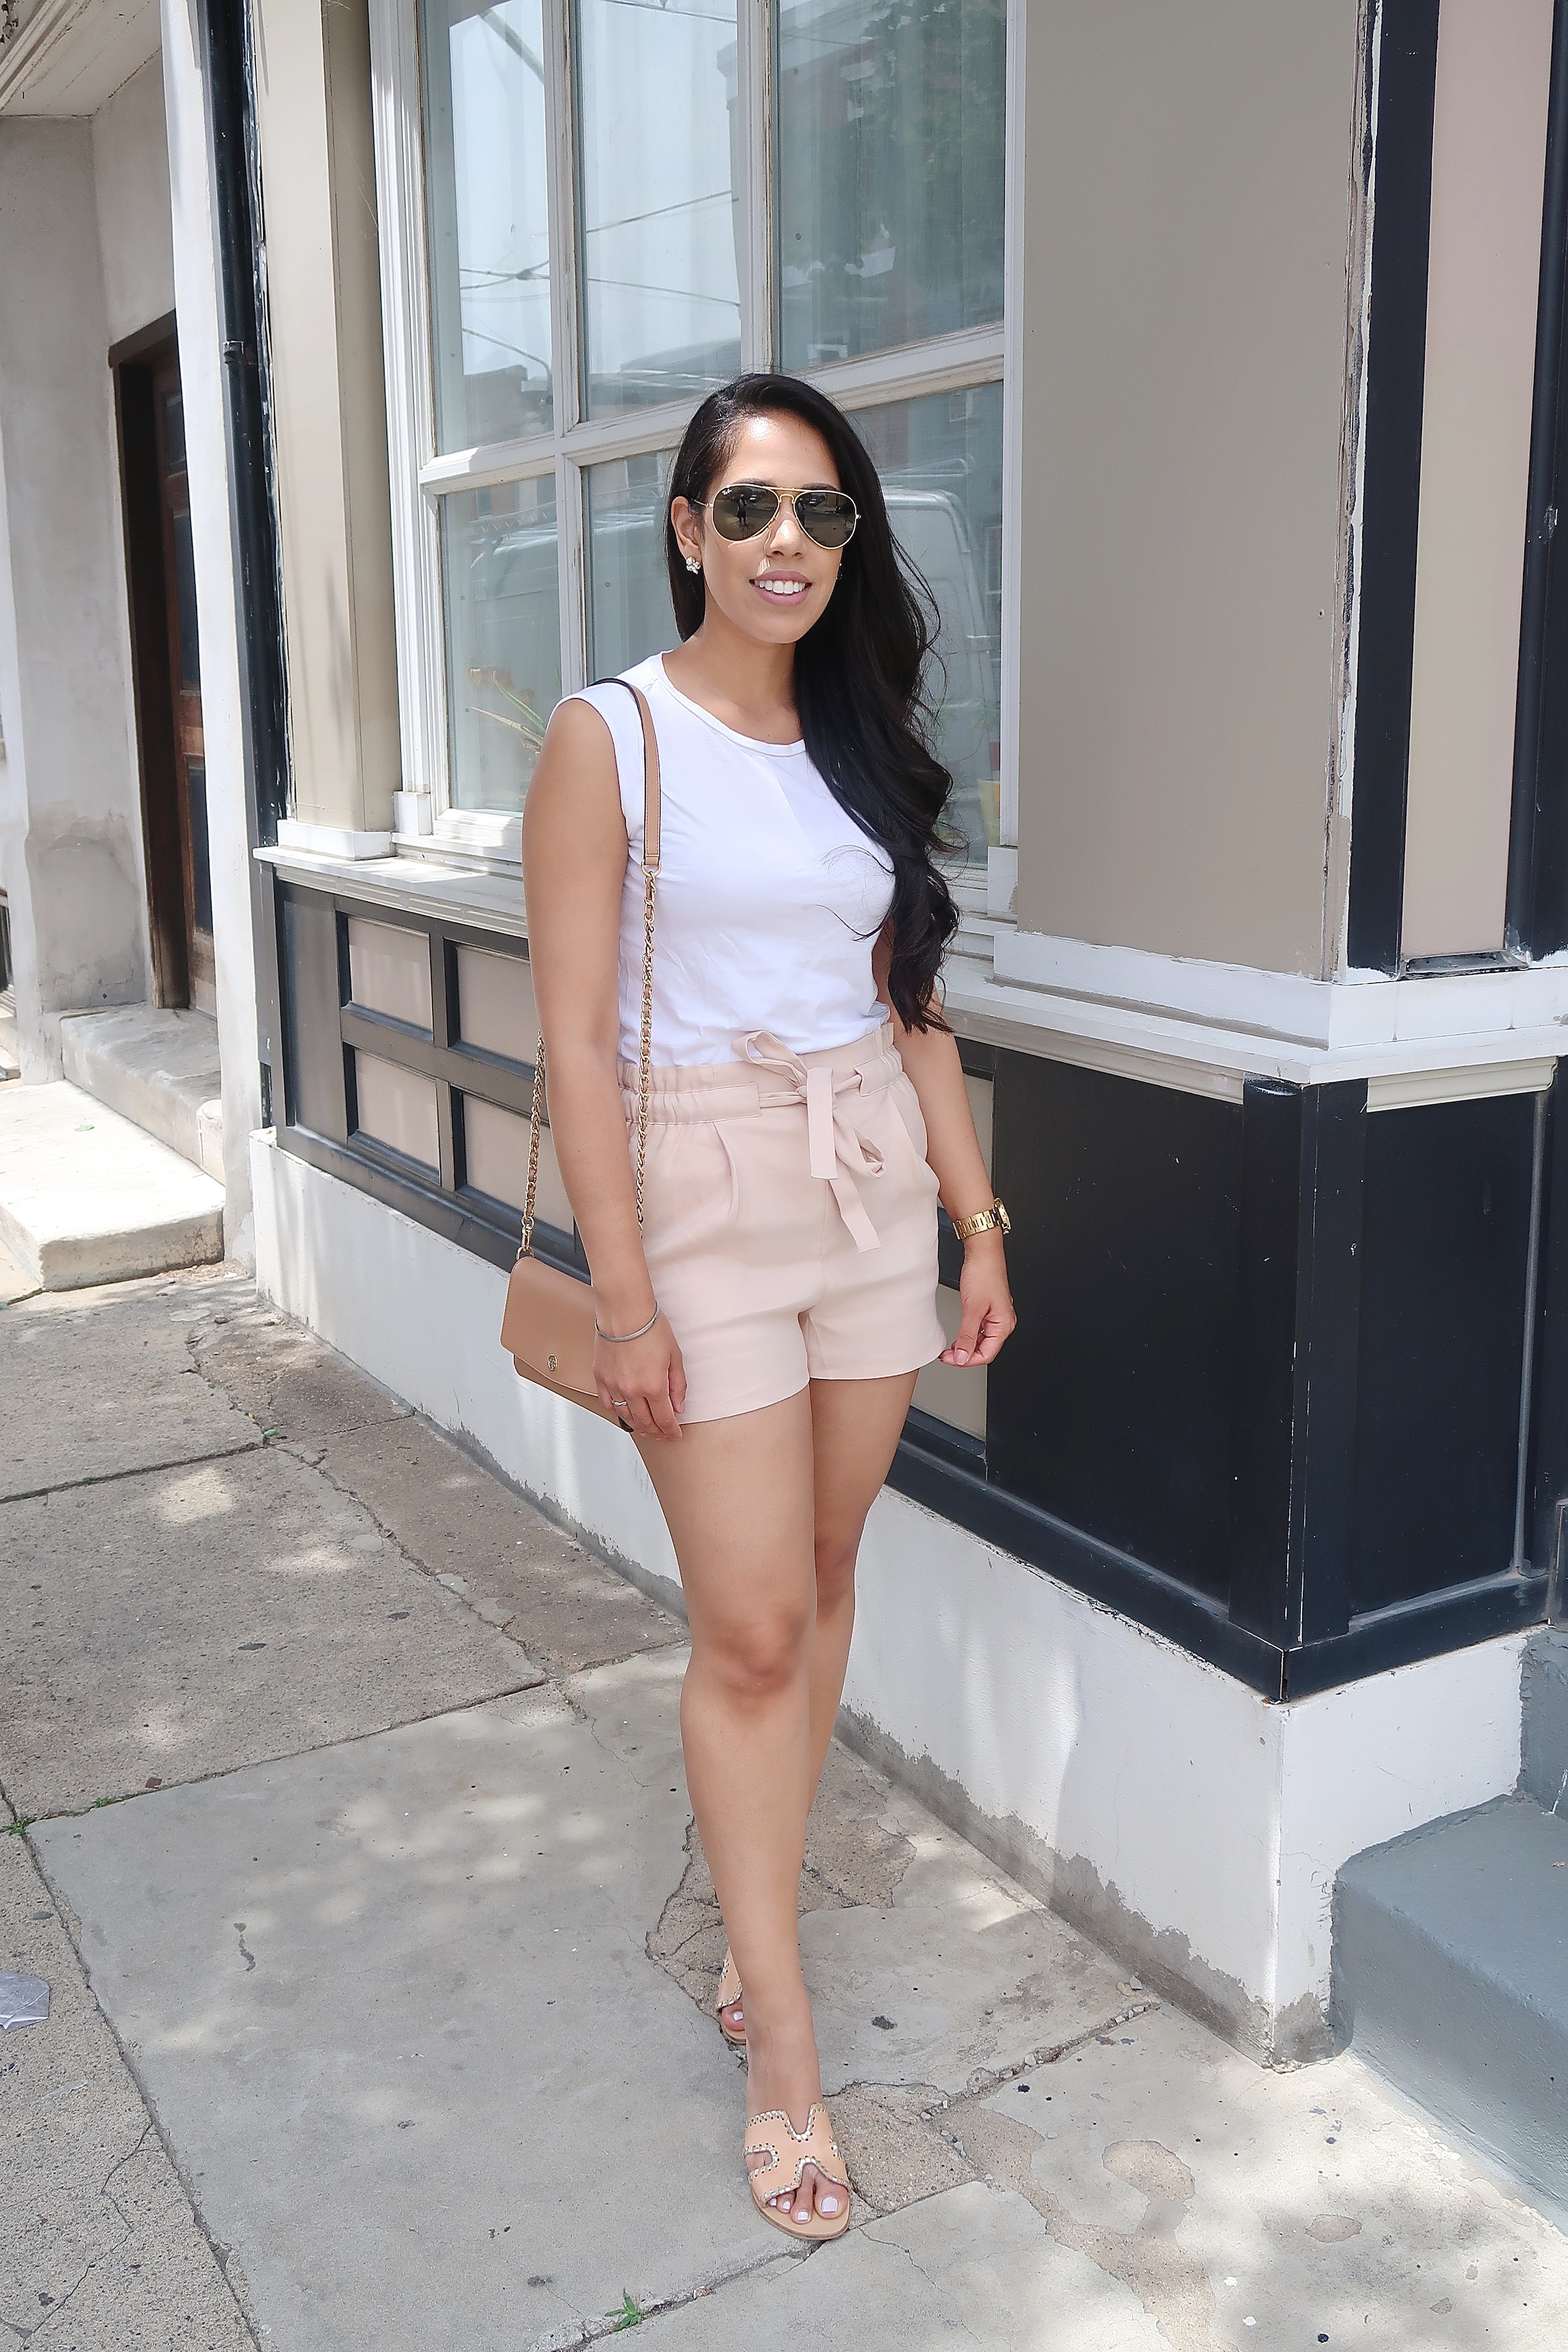 philadelphia-fashion-blogger-mygoldenbeauty-style.jpg